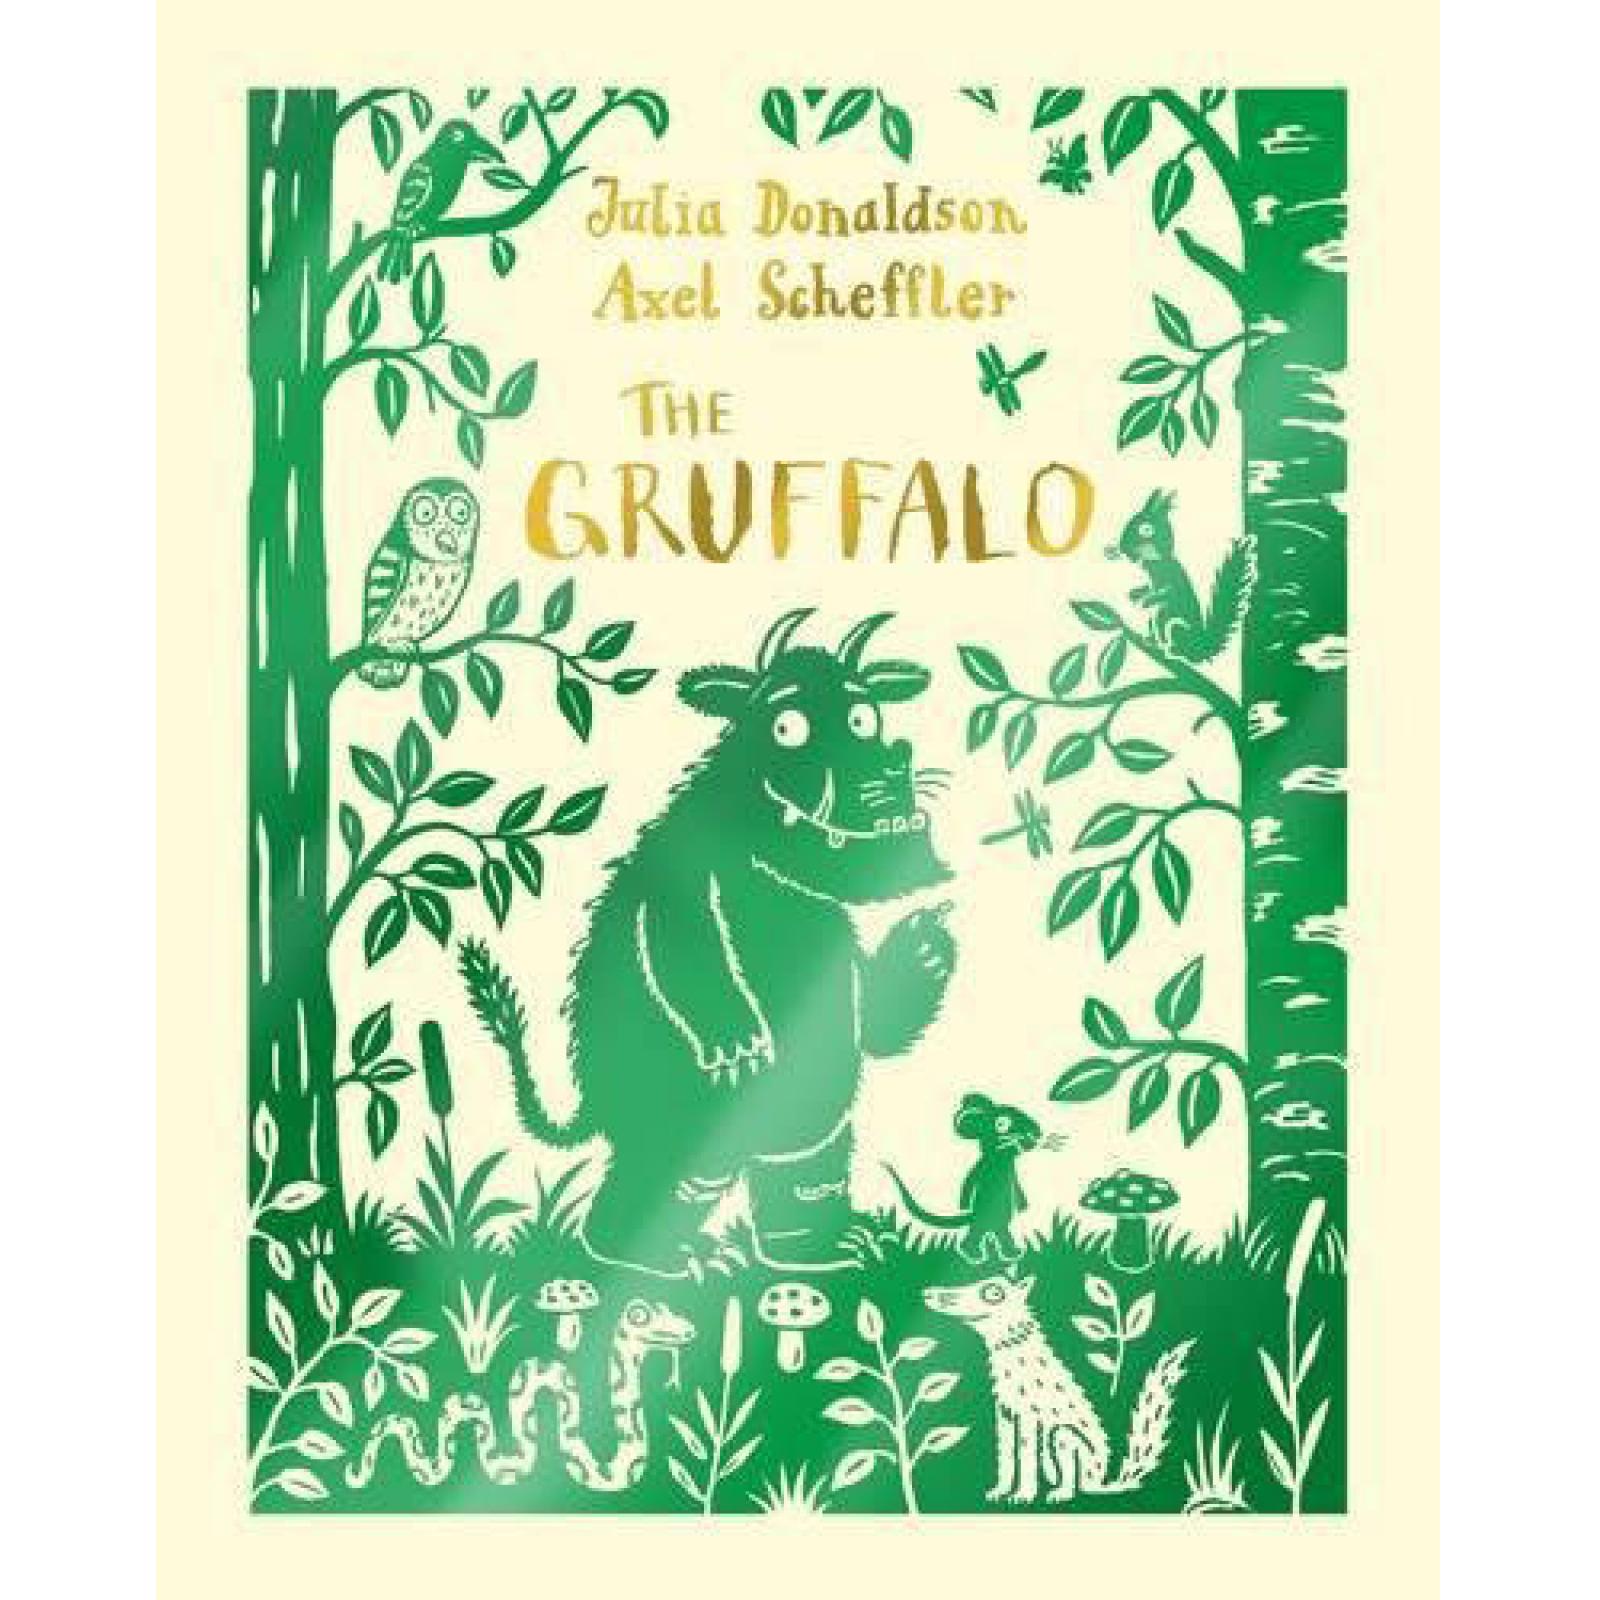 The Gruffalo Mini Hardback Edition